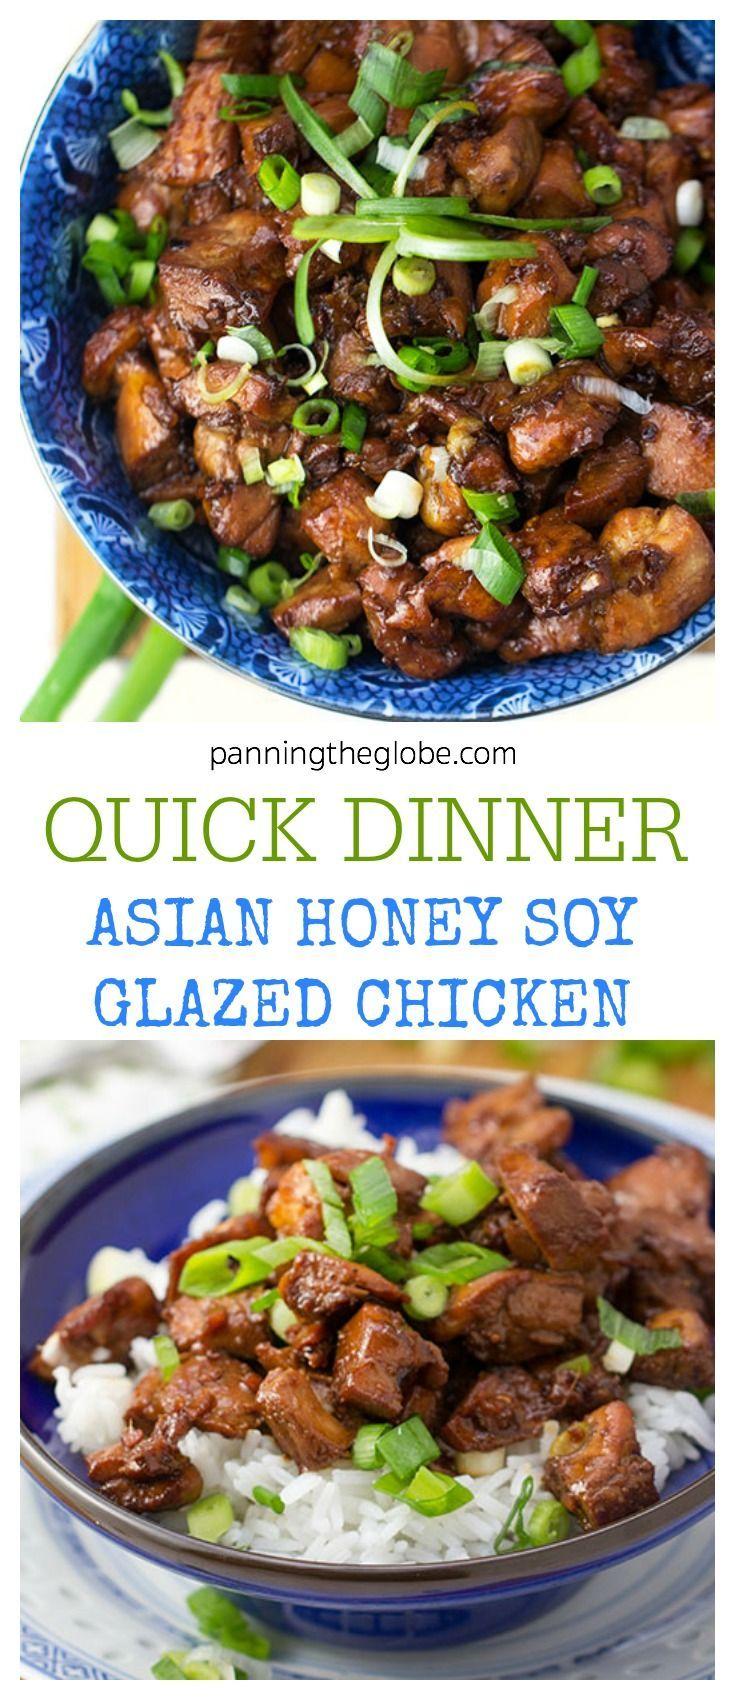 Asian Honey Soy Chicken